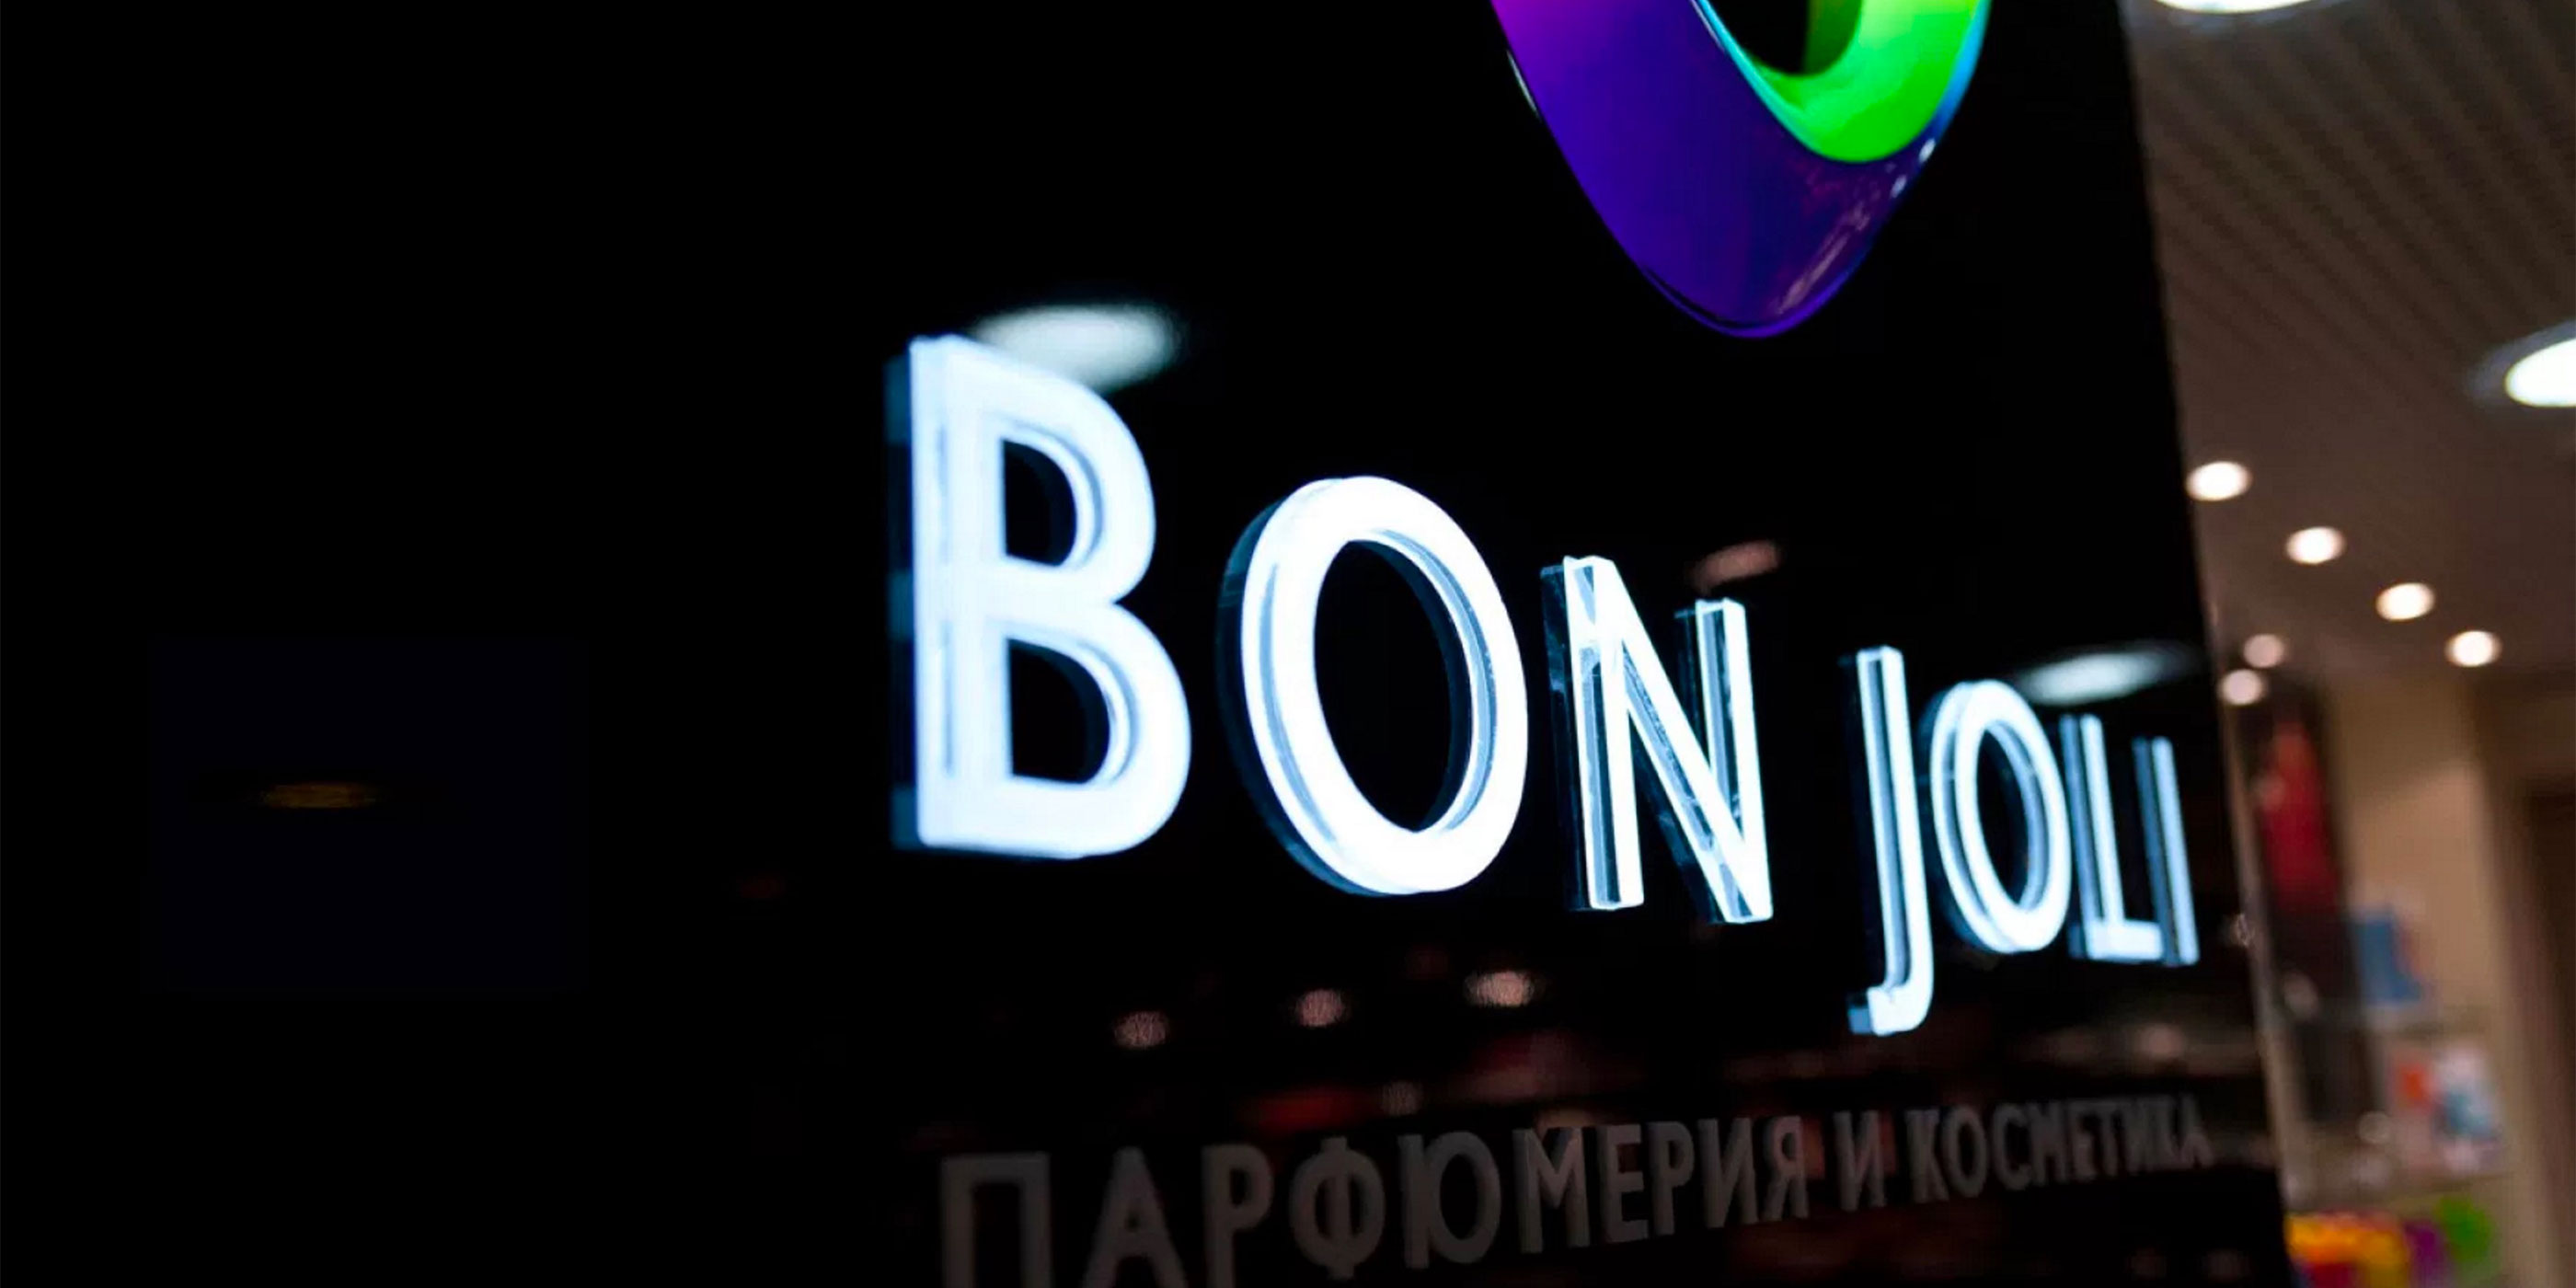 Бренд парфюмерии и косметики Bon Joli